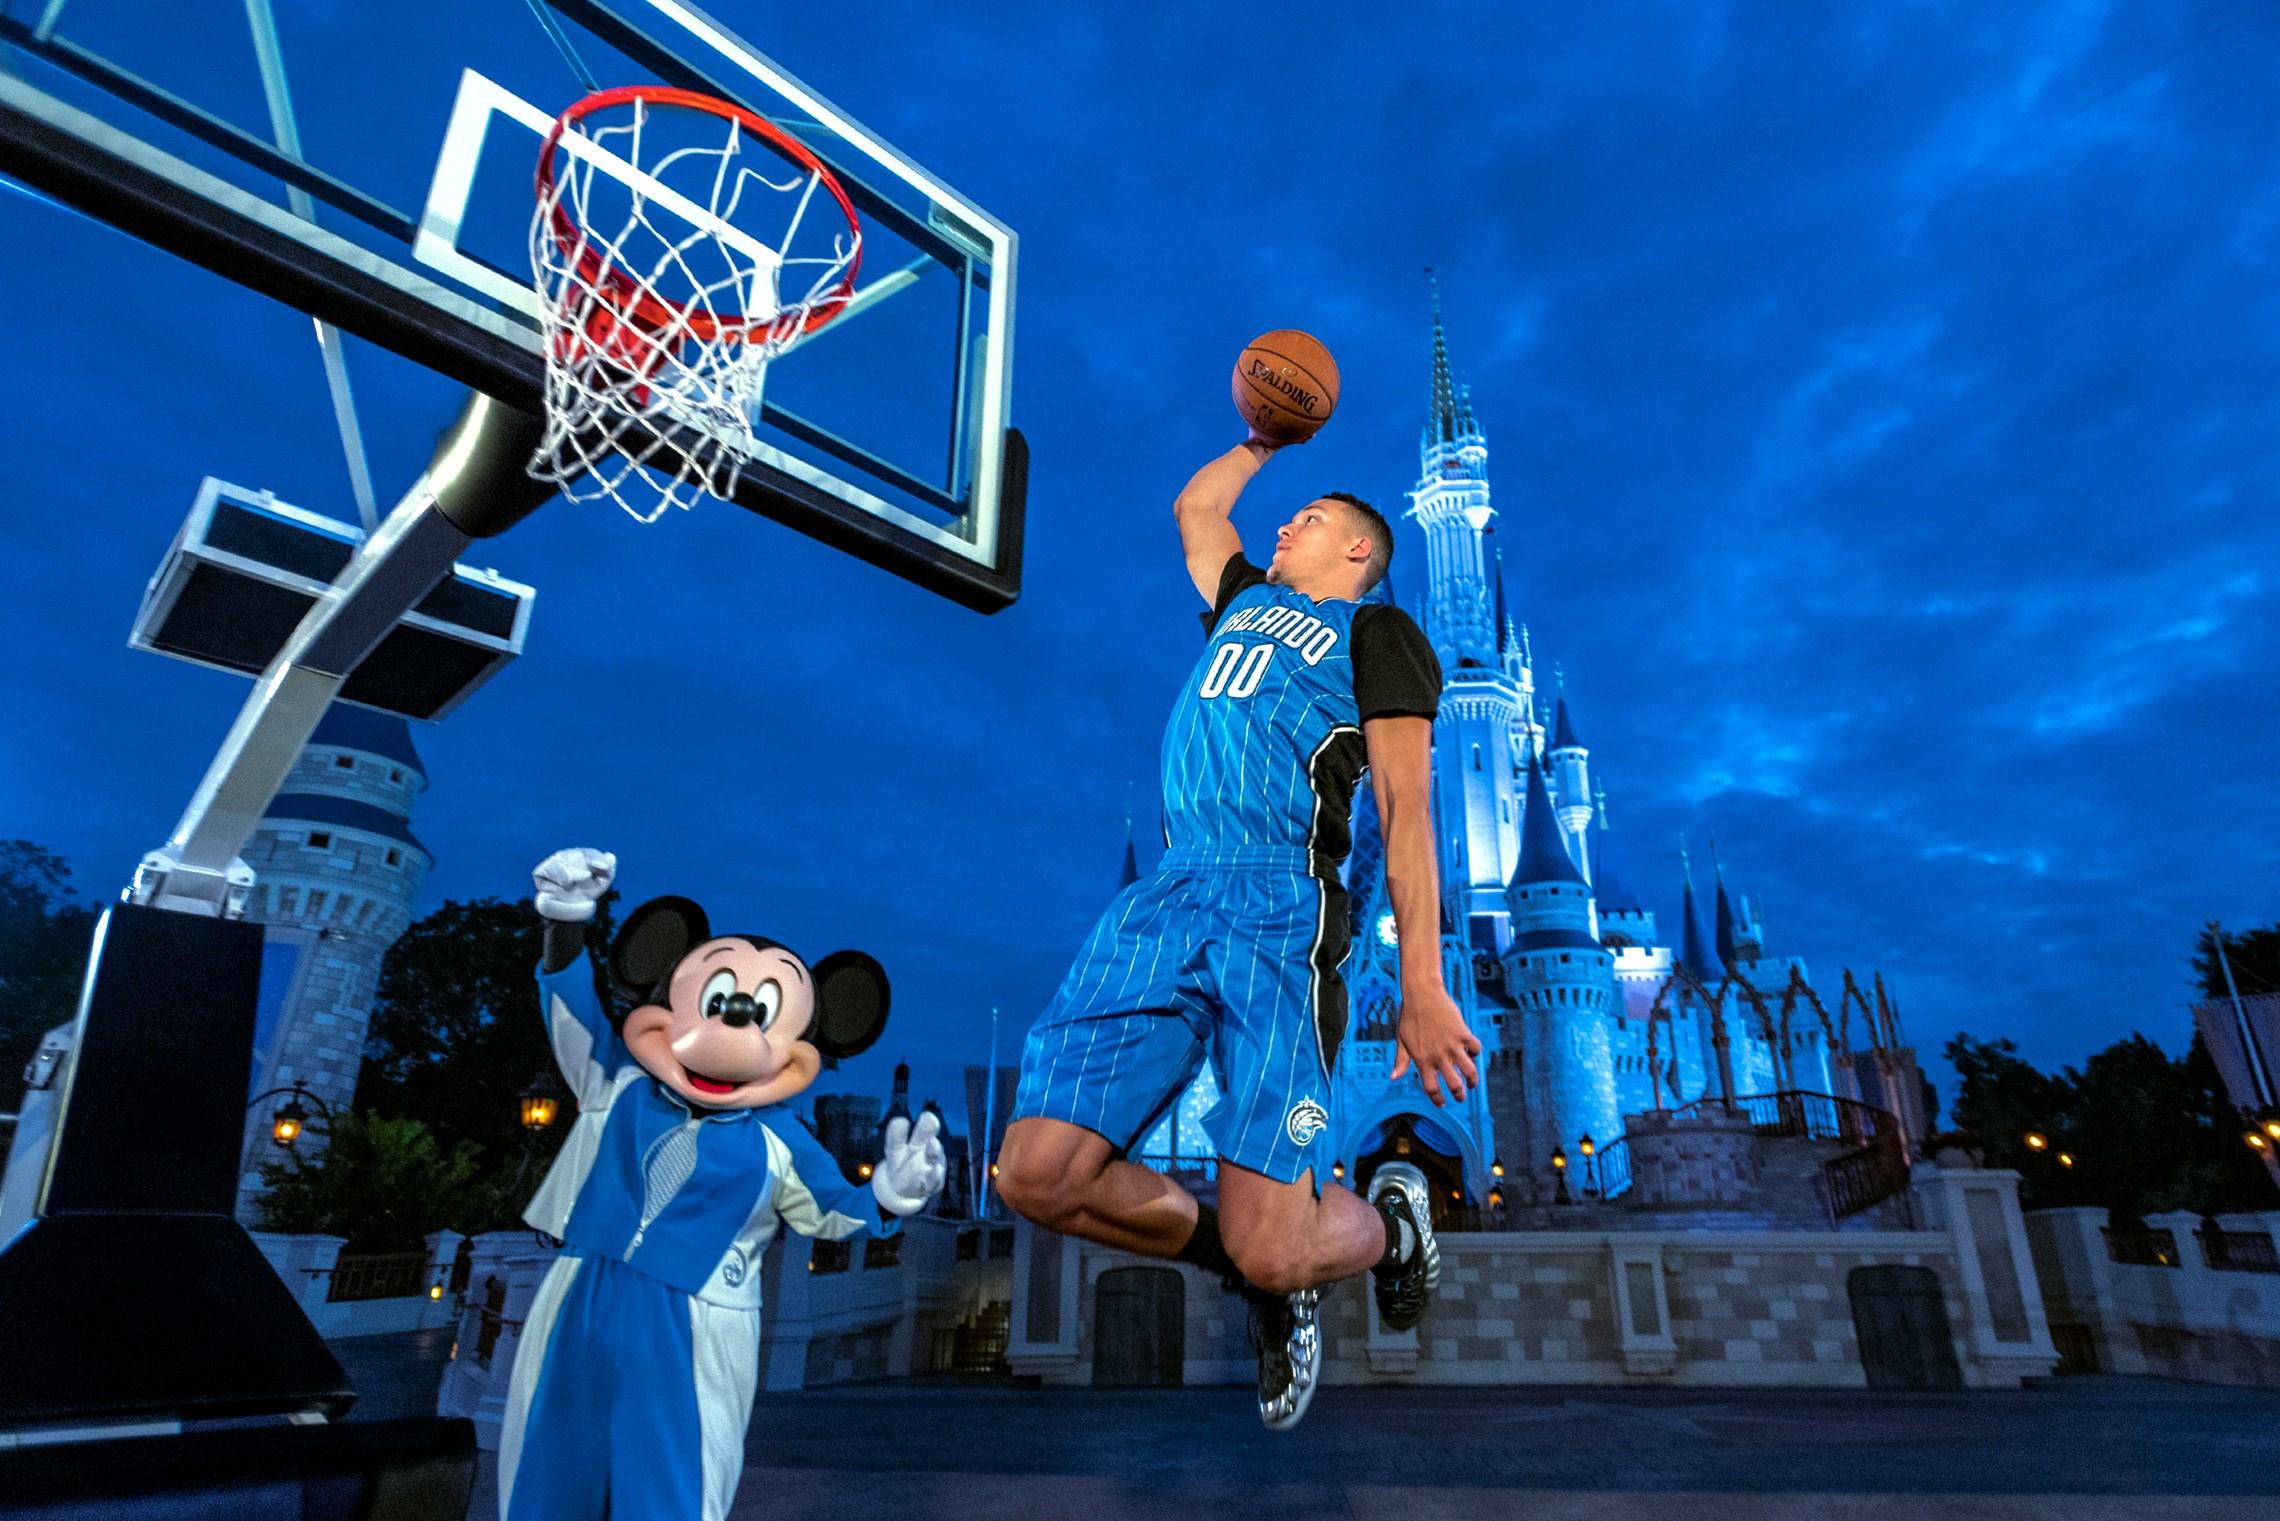 Walt Disney World Resort Orlando Magic jersey sponsorship